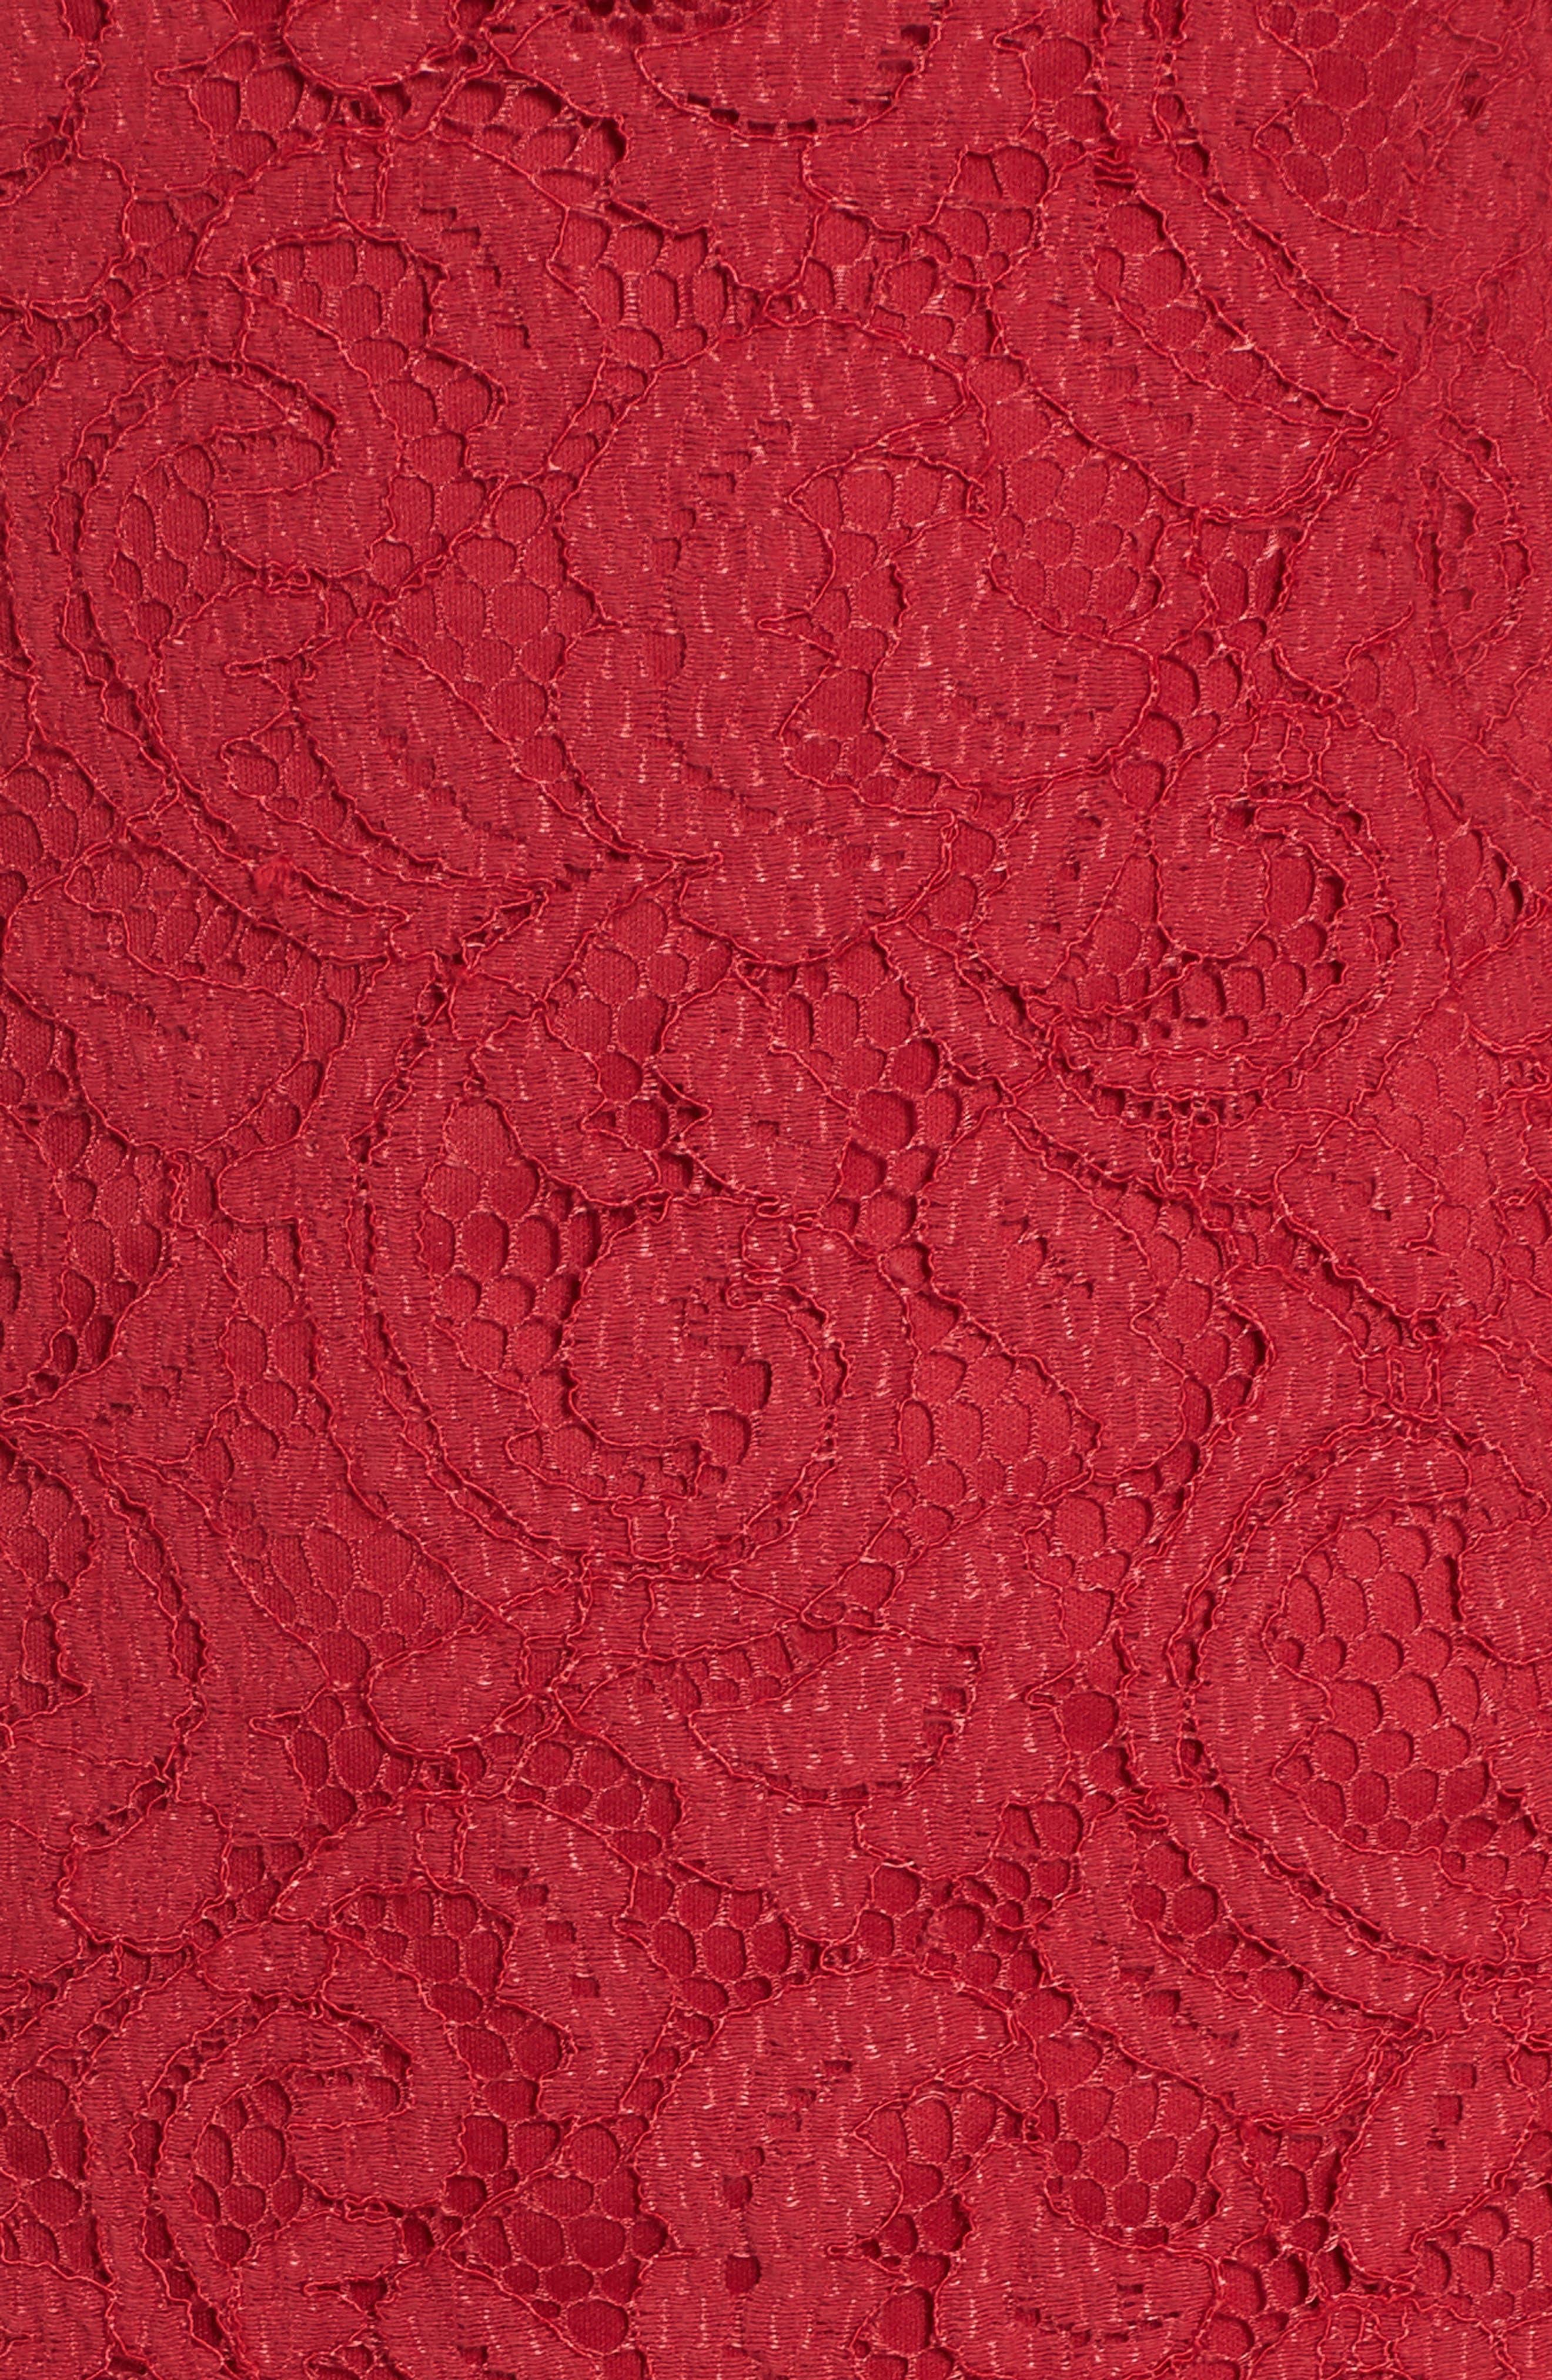 Lace Sheath Dress,                             Alternate thumbnail 5, color,                             Cherry